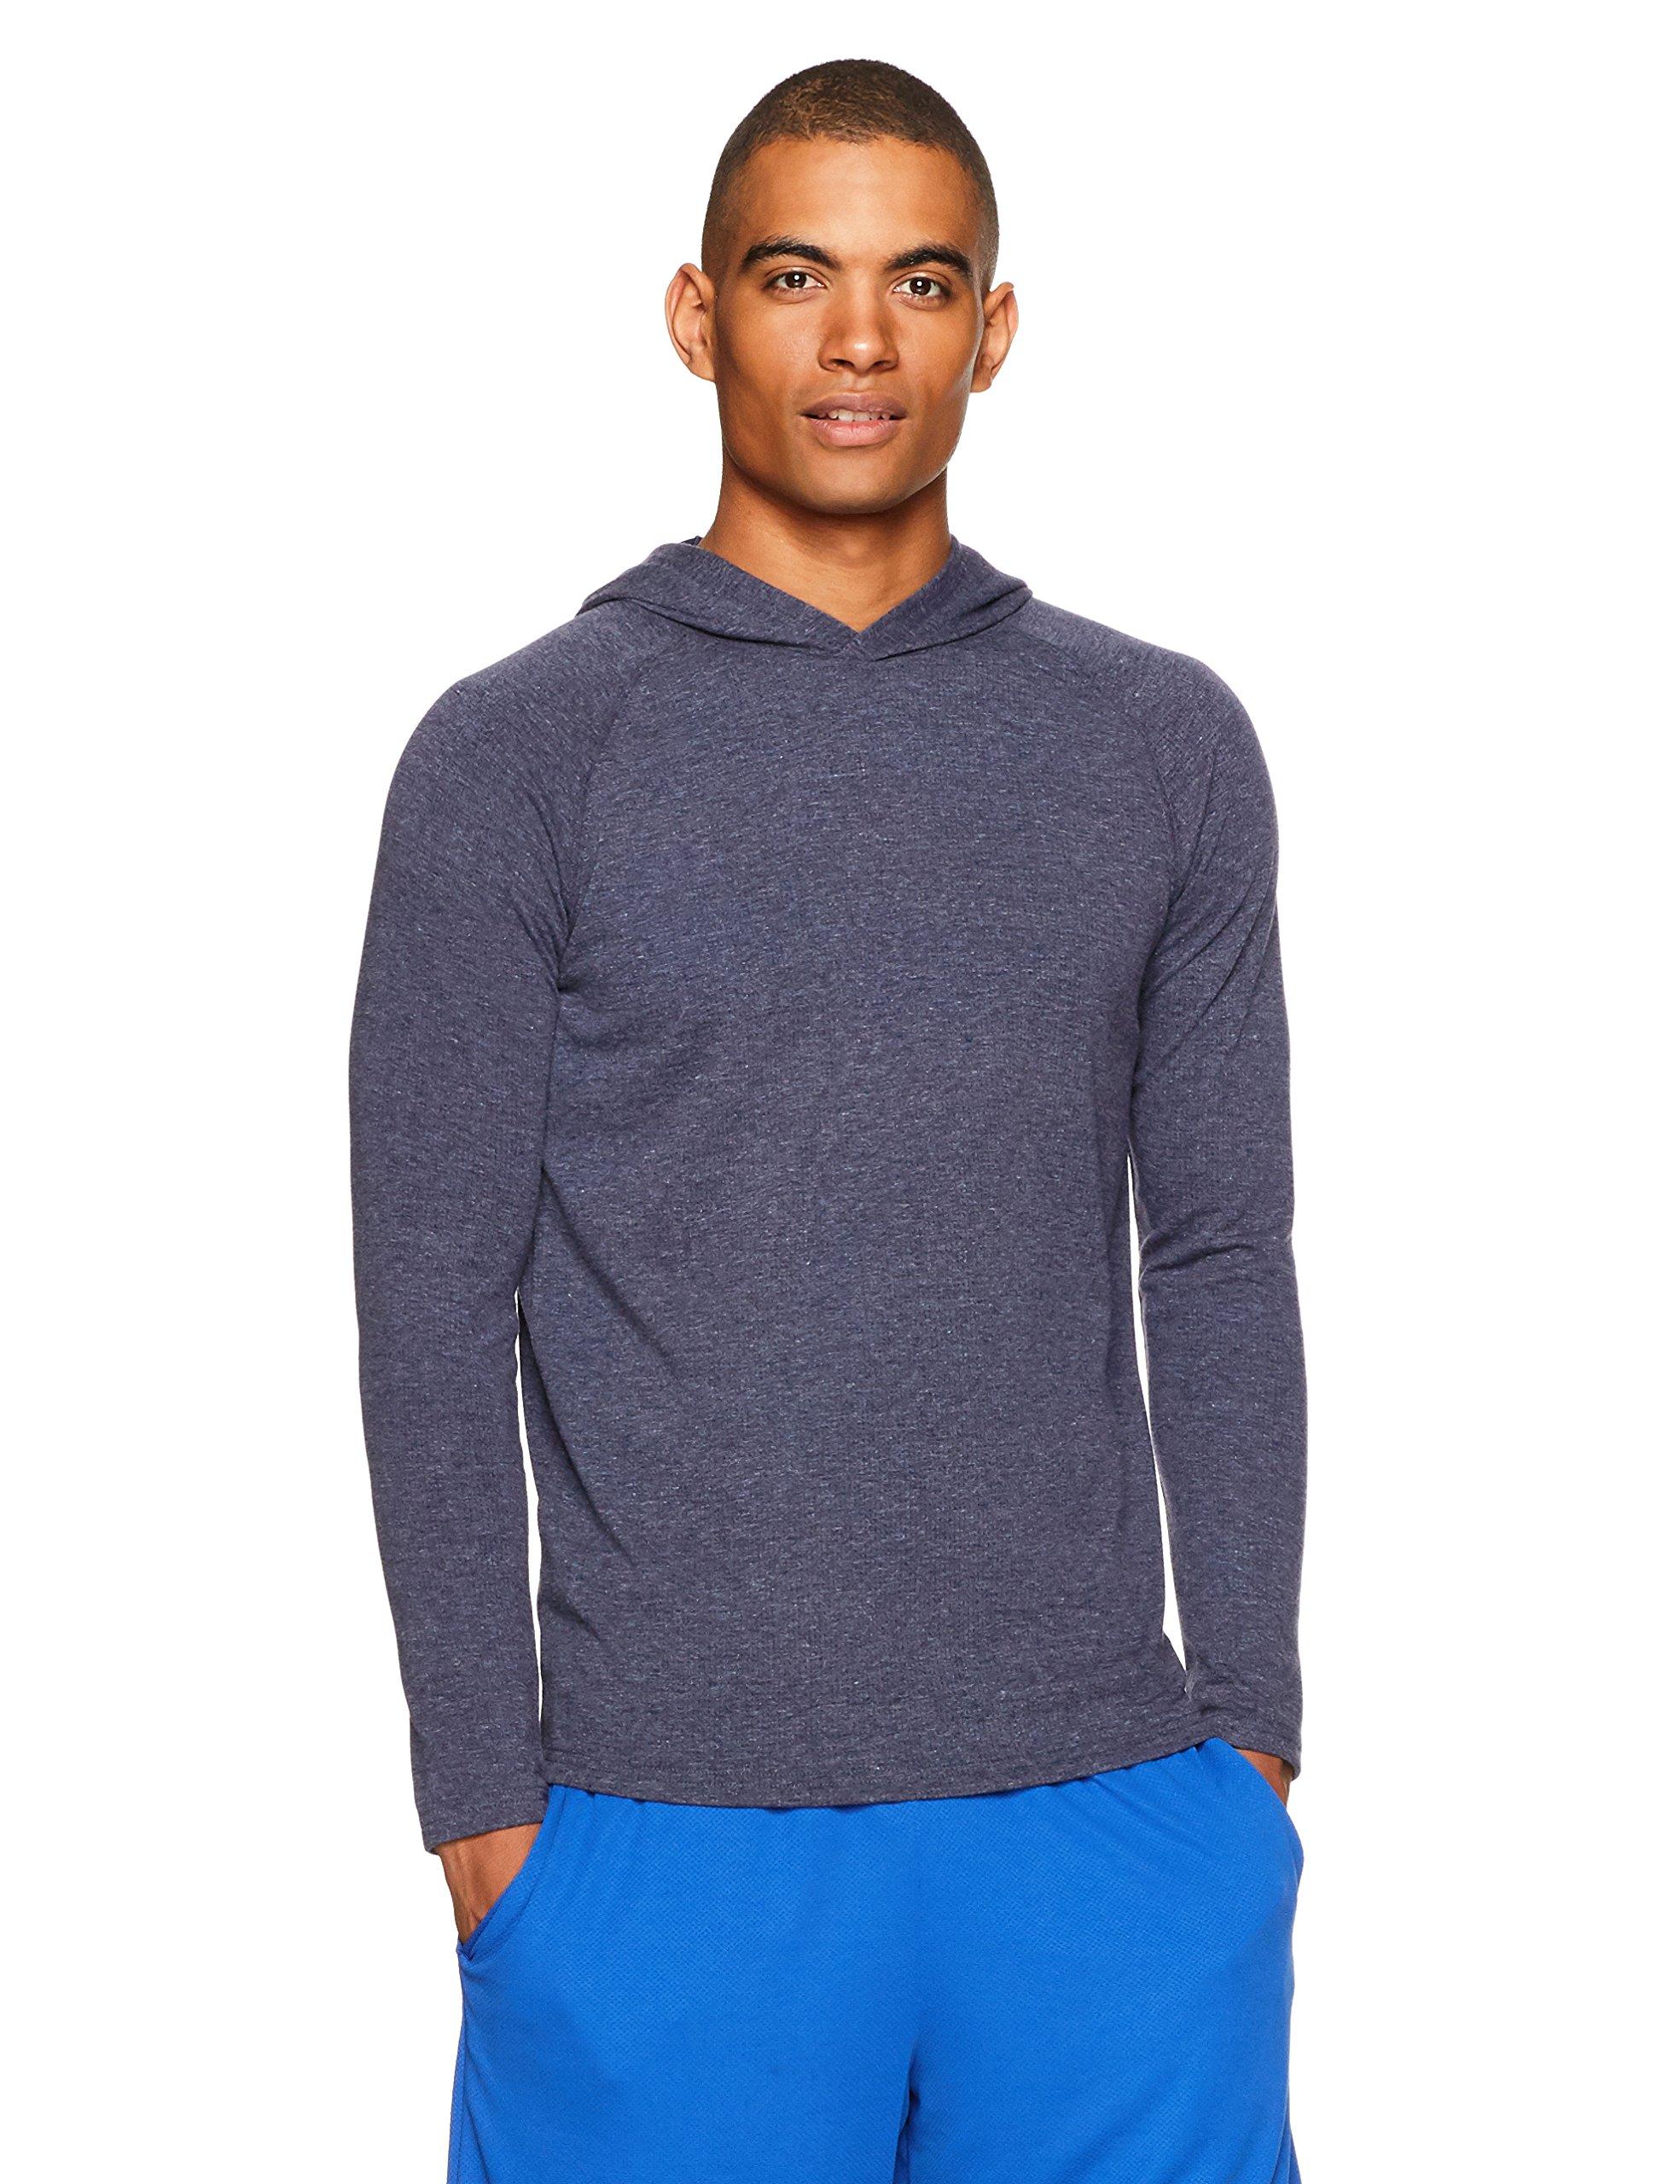 Amazon Essentials Men's Performance Hooded Shirt, Navy Heather, Large